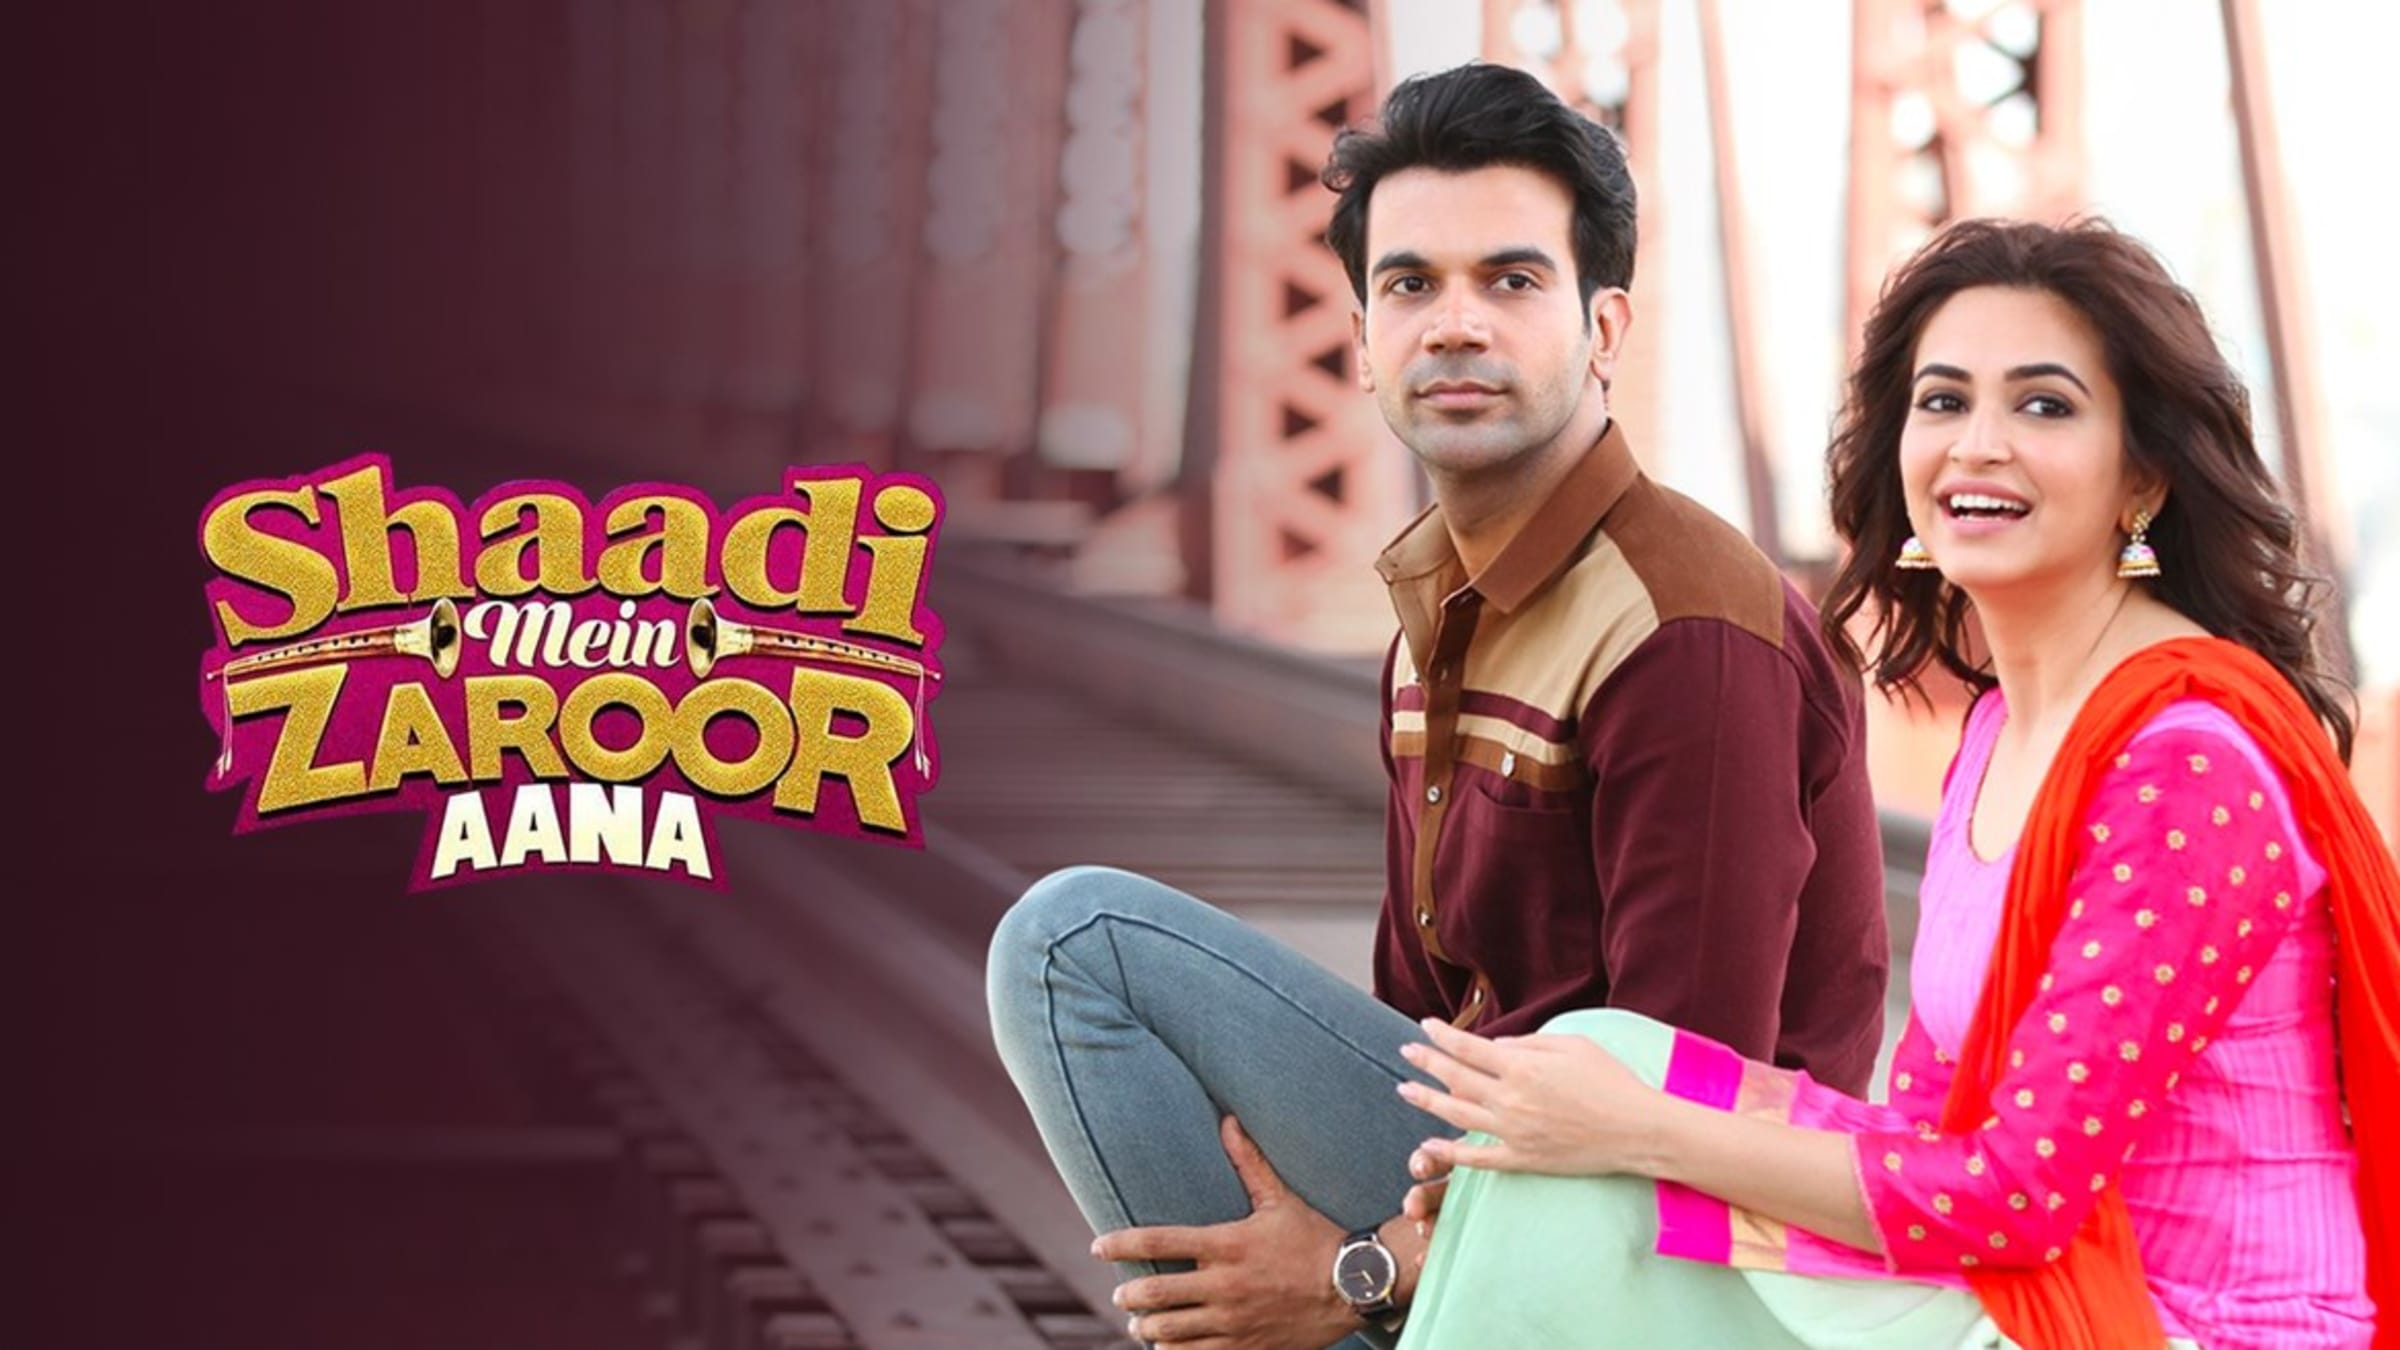 Watch Shaadi Mein Zaroor Aana Movie Online - Stream Full